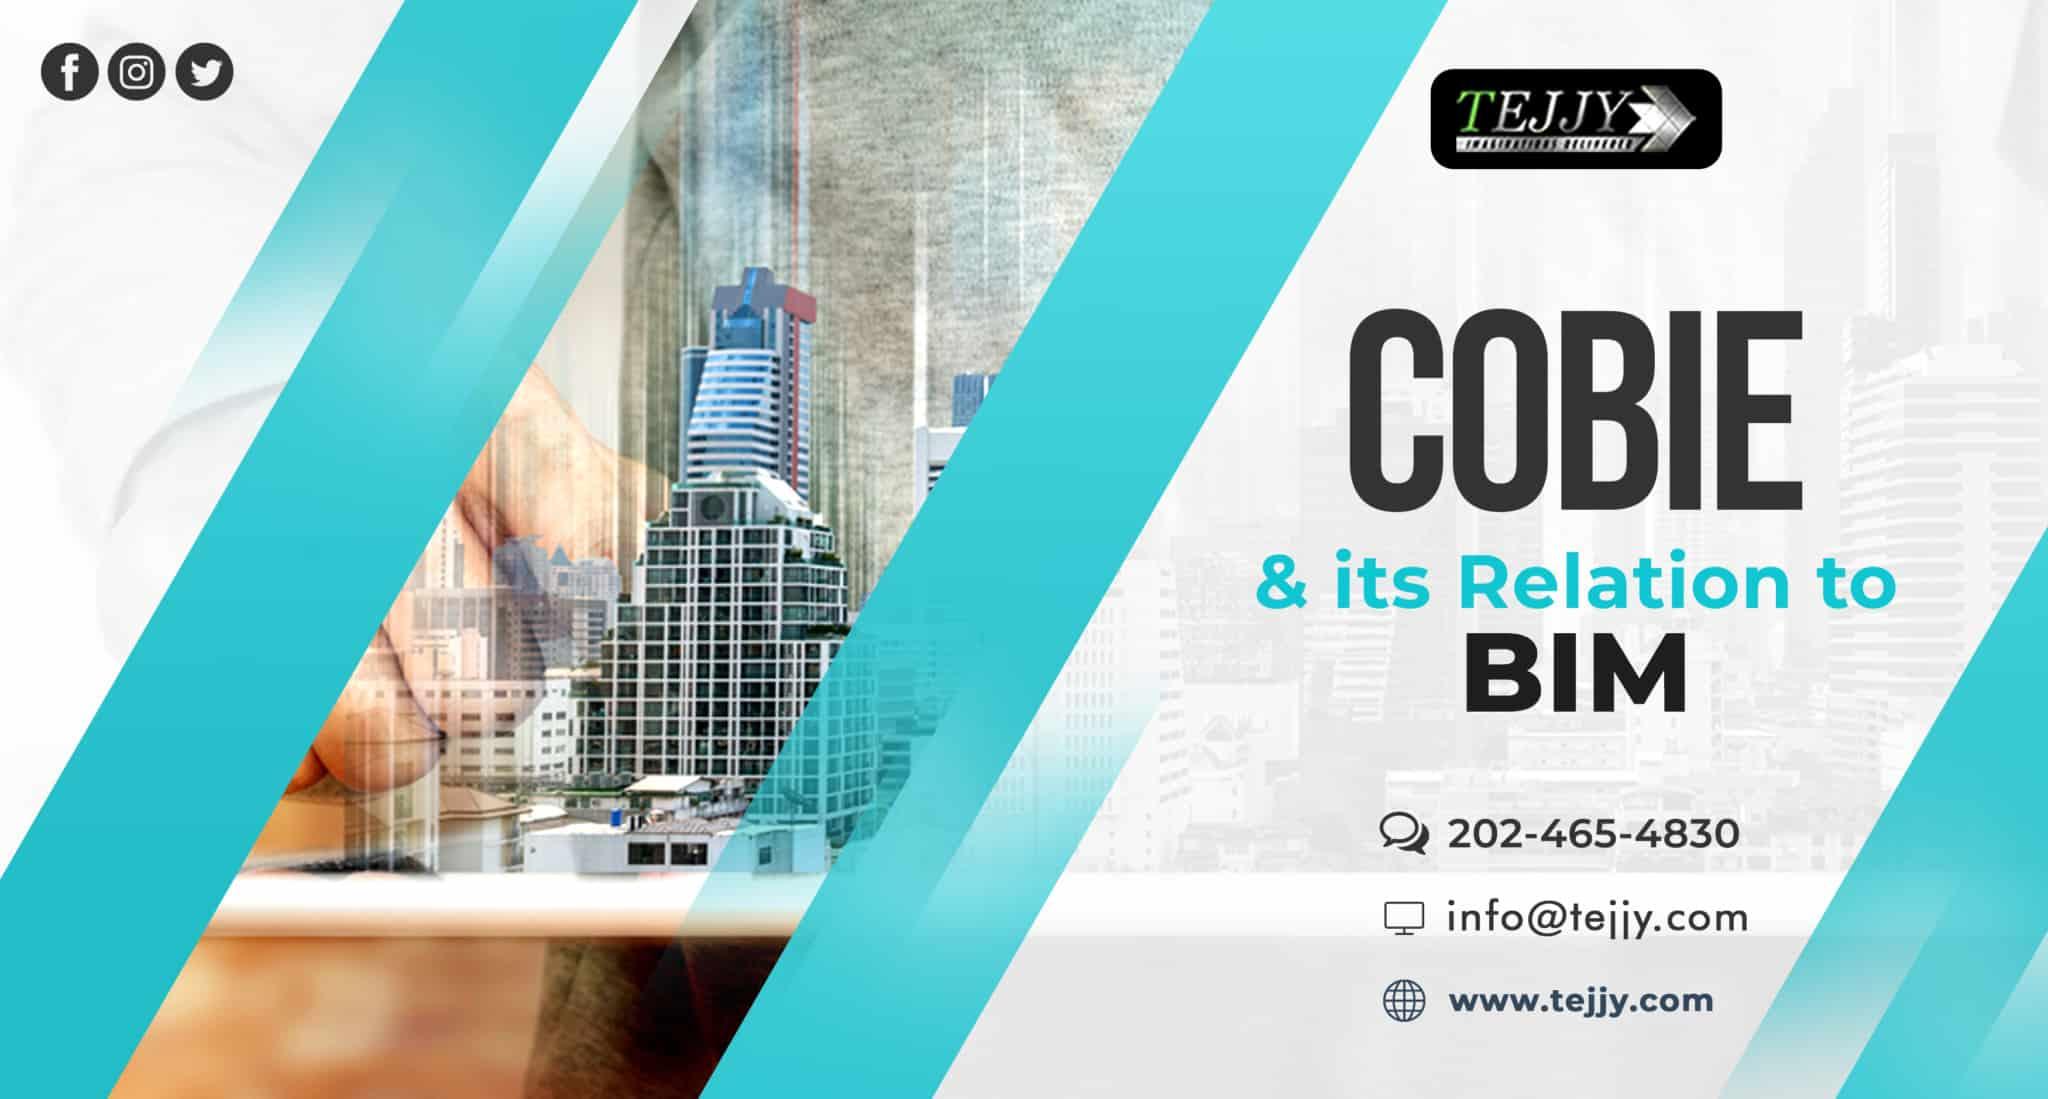 Tejjy Inc. COBie BIM services in usa